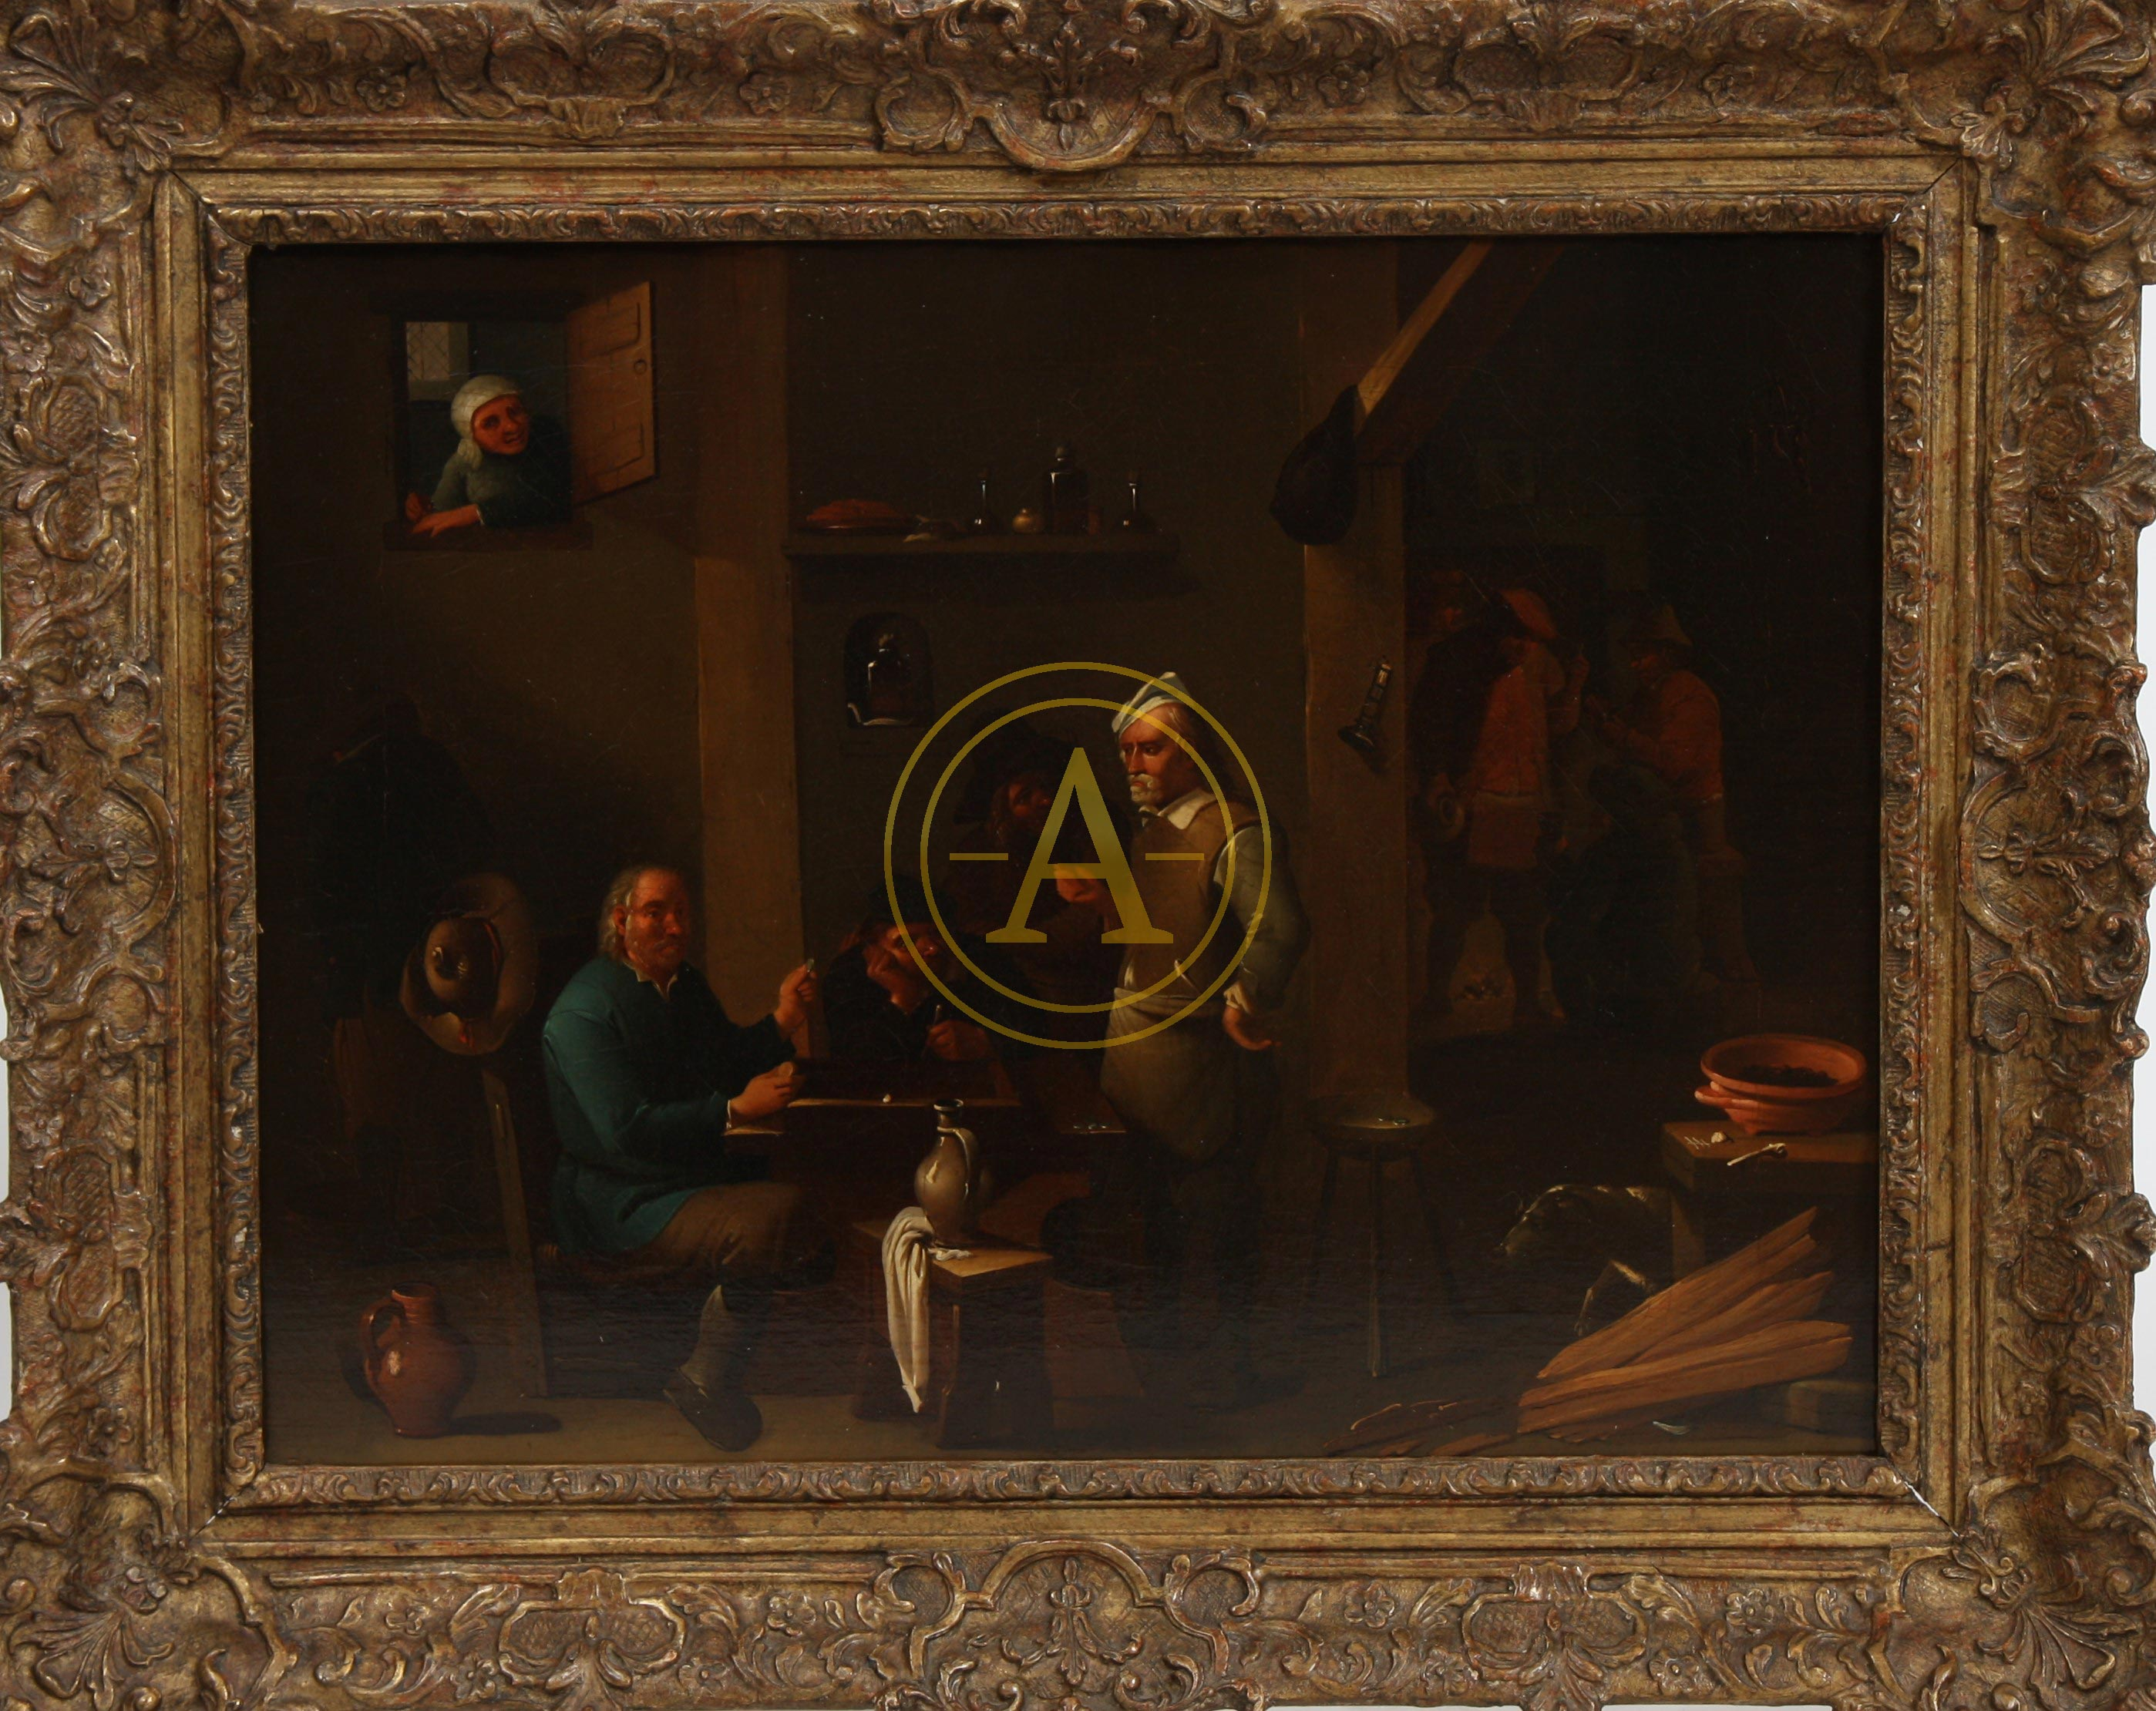 tableau scene d 39 interieur flamand xviii antiques trade gallery. Black Bedroom Furniture Sets. Home Design Ideas